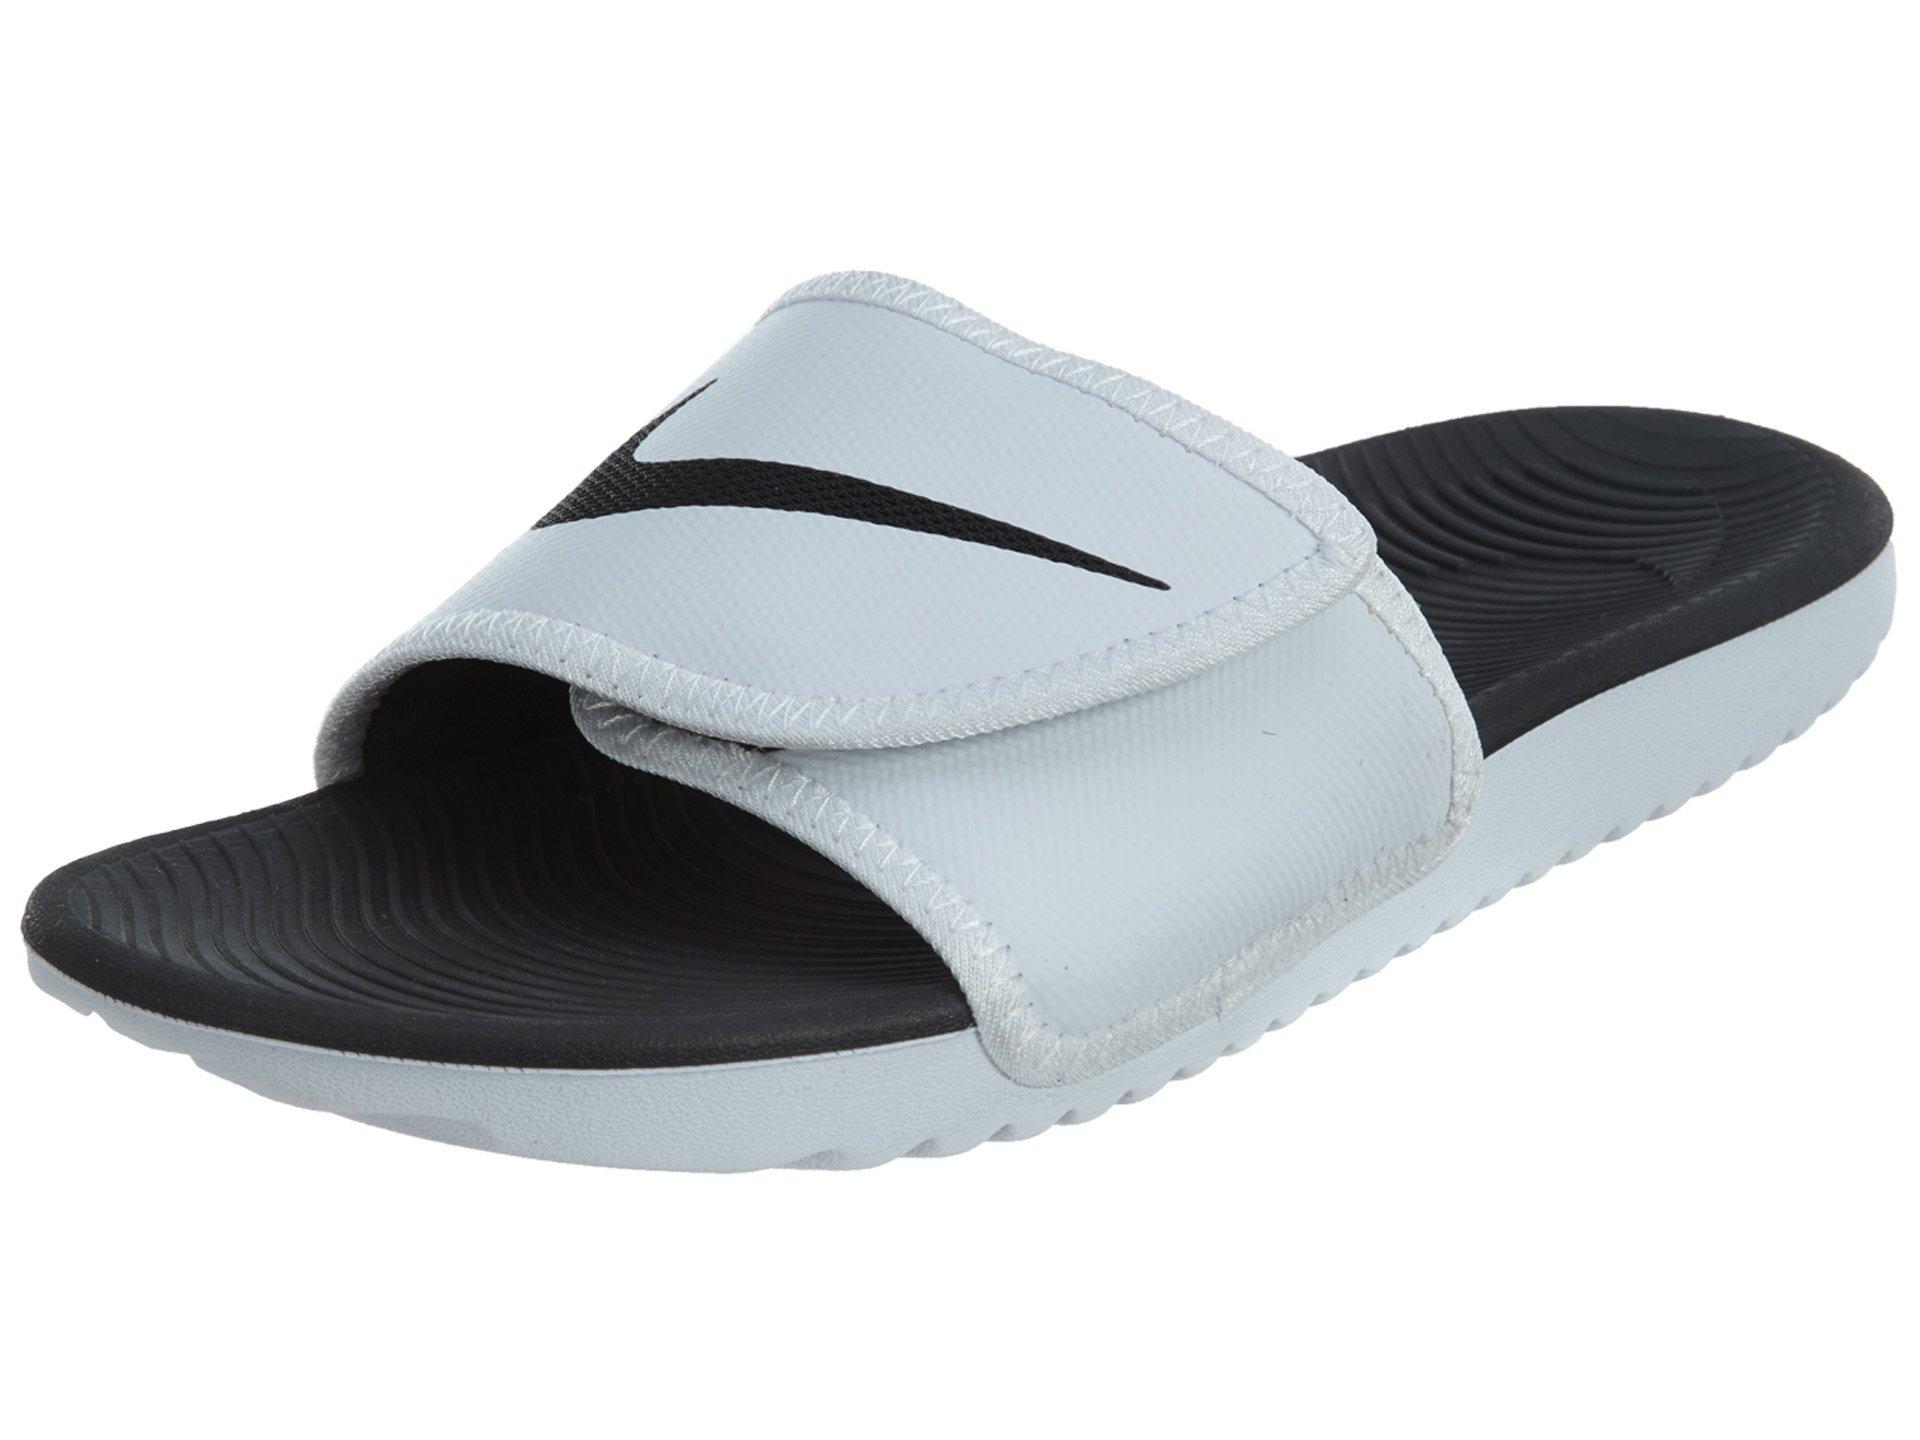 Nike Men's Kawa Adjustable Slide Sandals White/Black-White 11